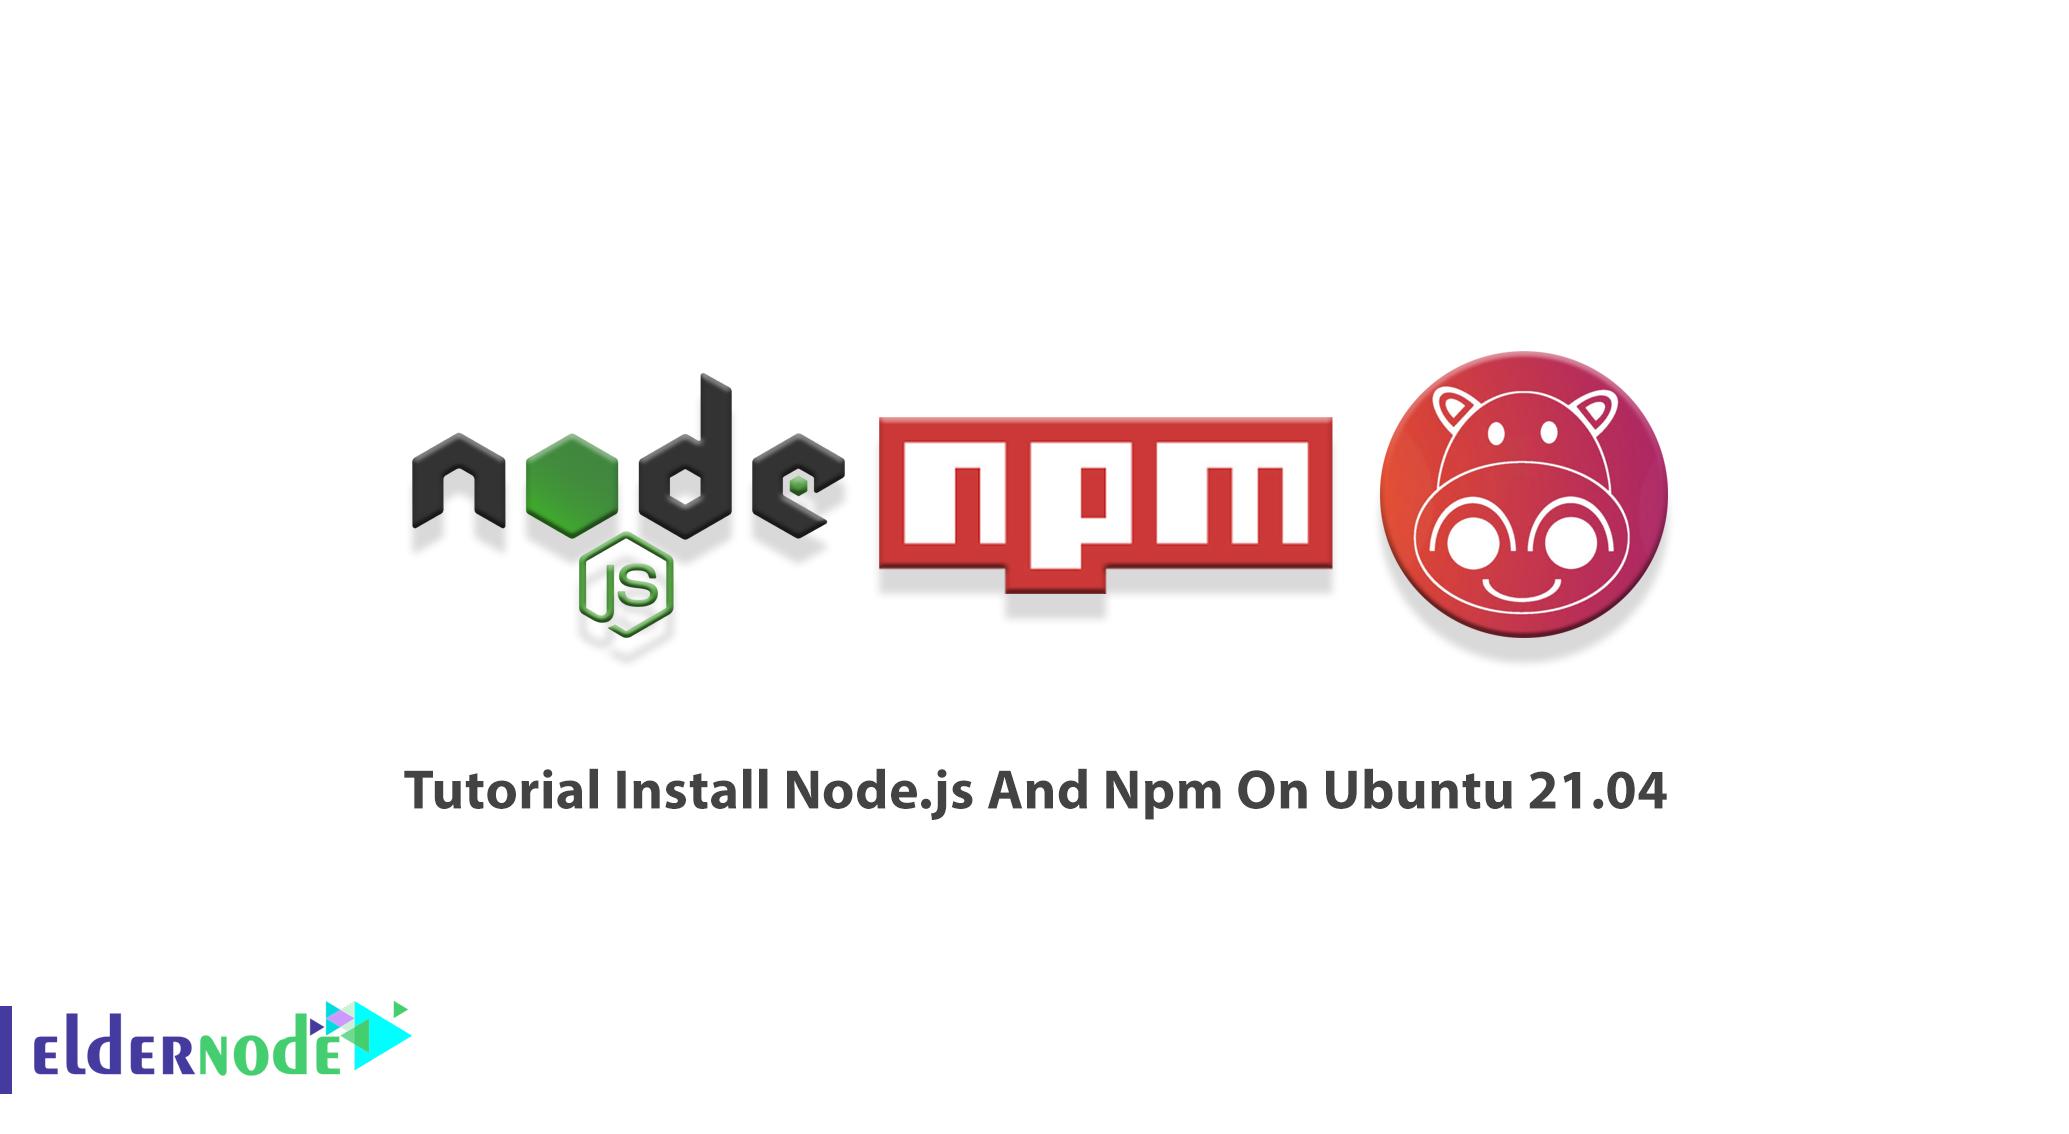 Tutorial Install Node.js And Npm On Ubuntu 21.04